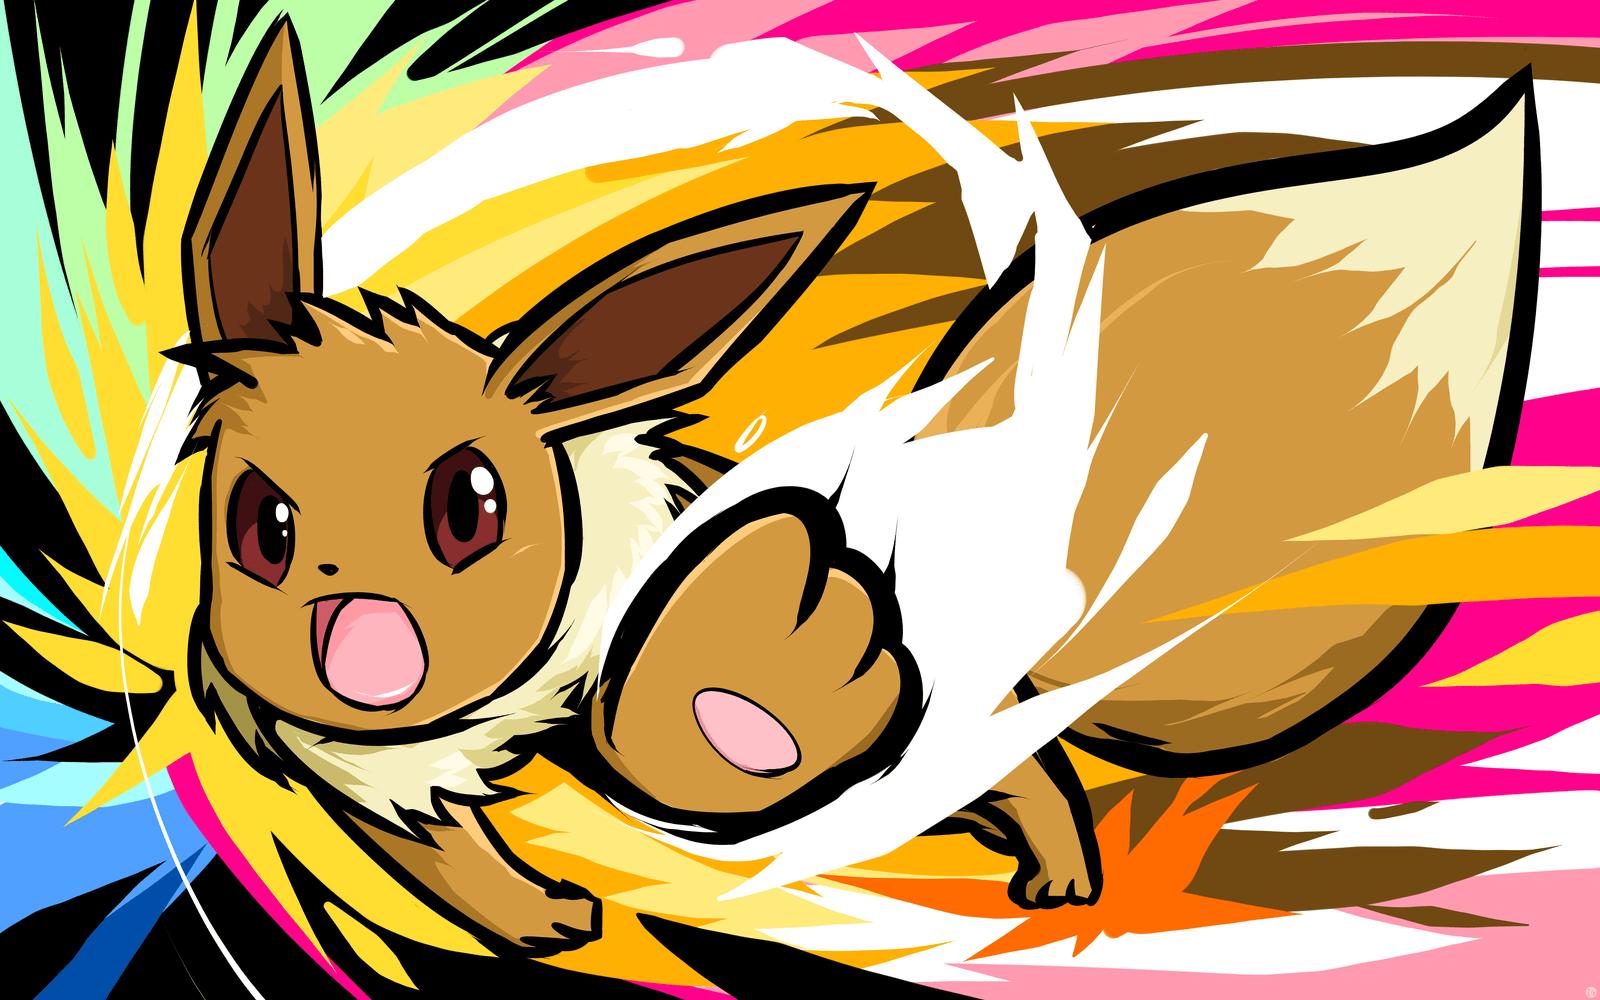 Cute Baby Boy Full Hd Wallpaper Fondos De Pantalla De Pokemon Wallpapers De Pokemon Gratis